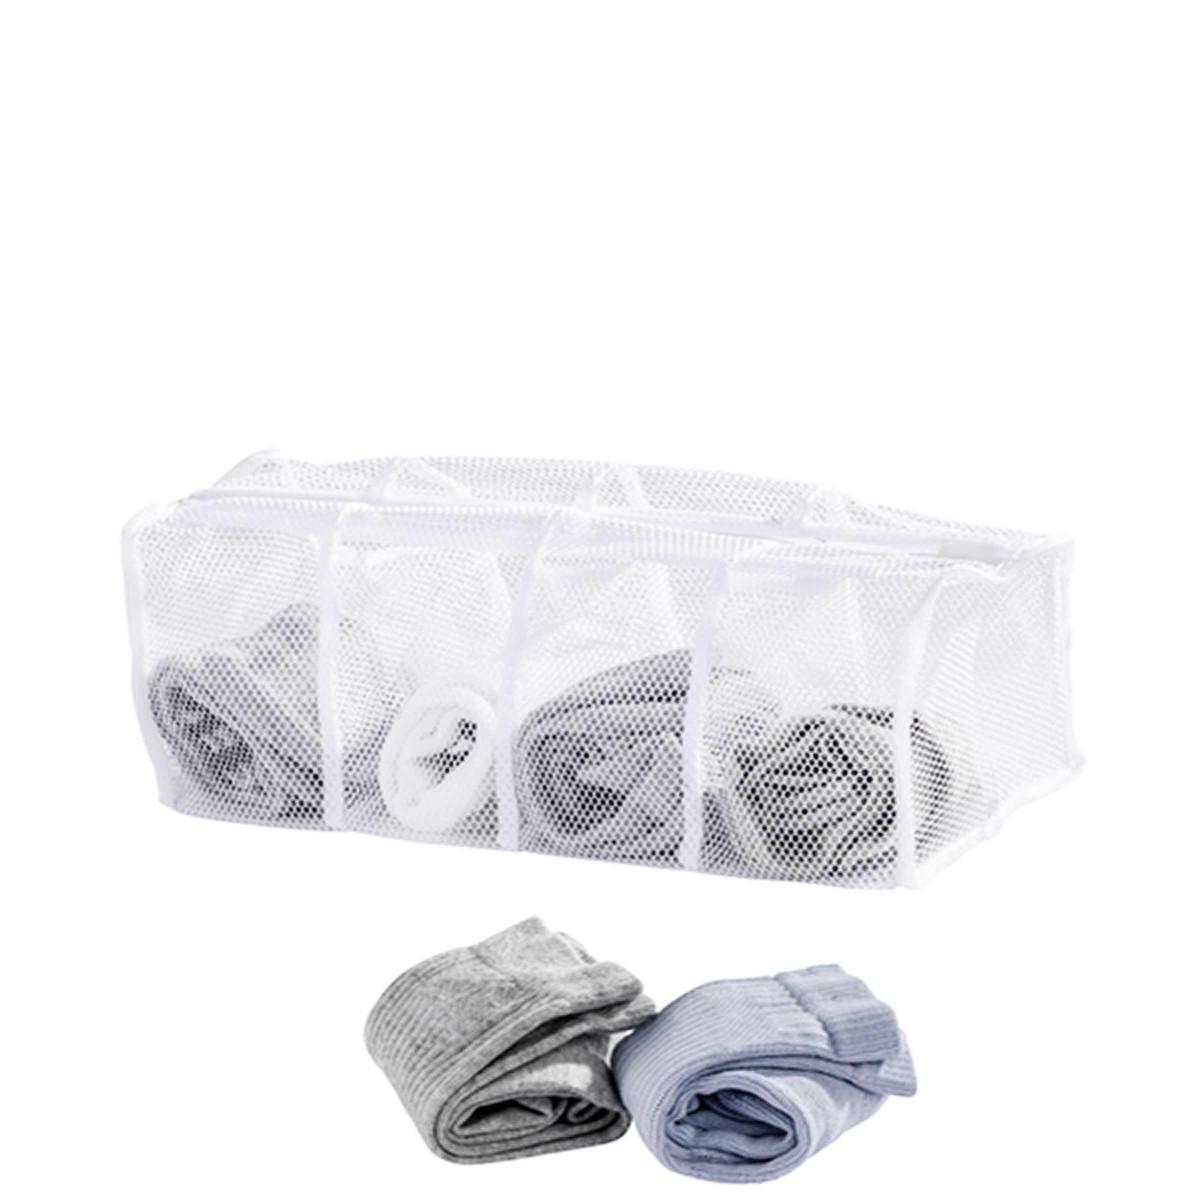 filet linge chaussettes 4 compartiments. Black Bedroom Furniture Sets. Home Design Ideas